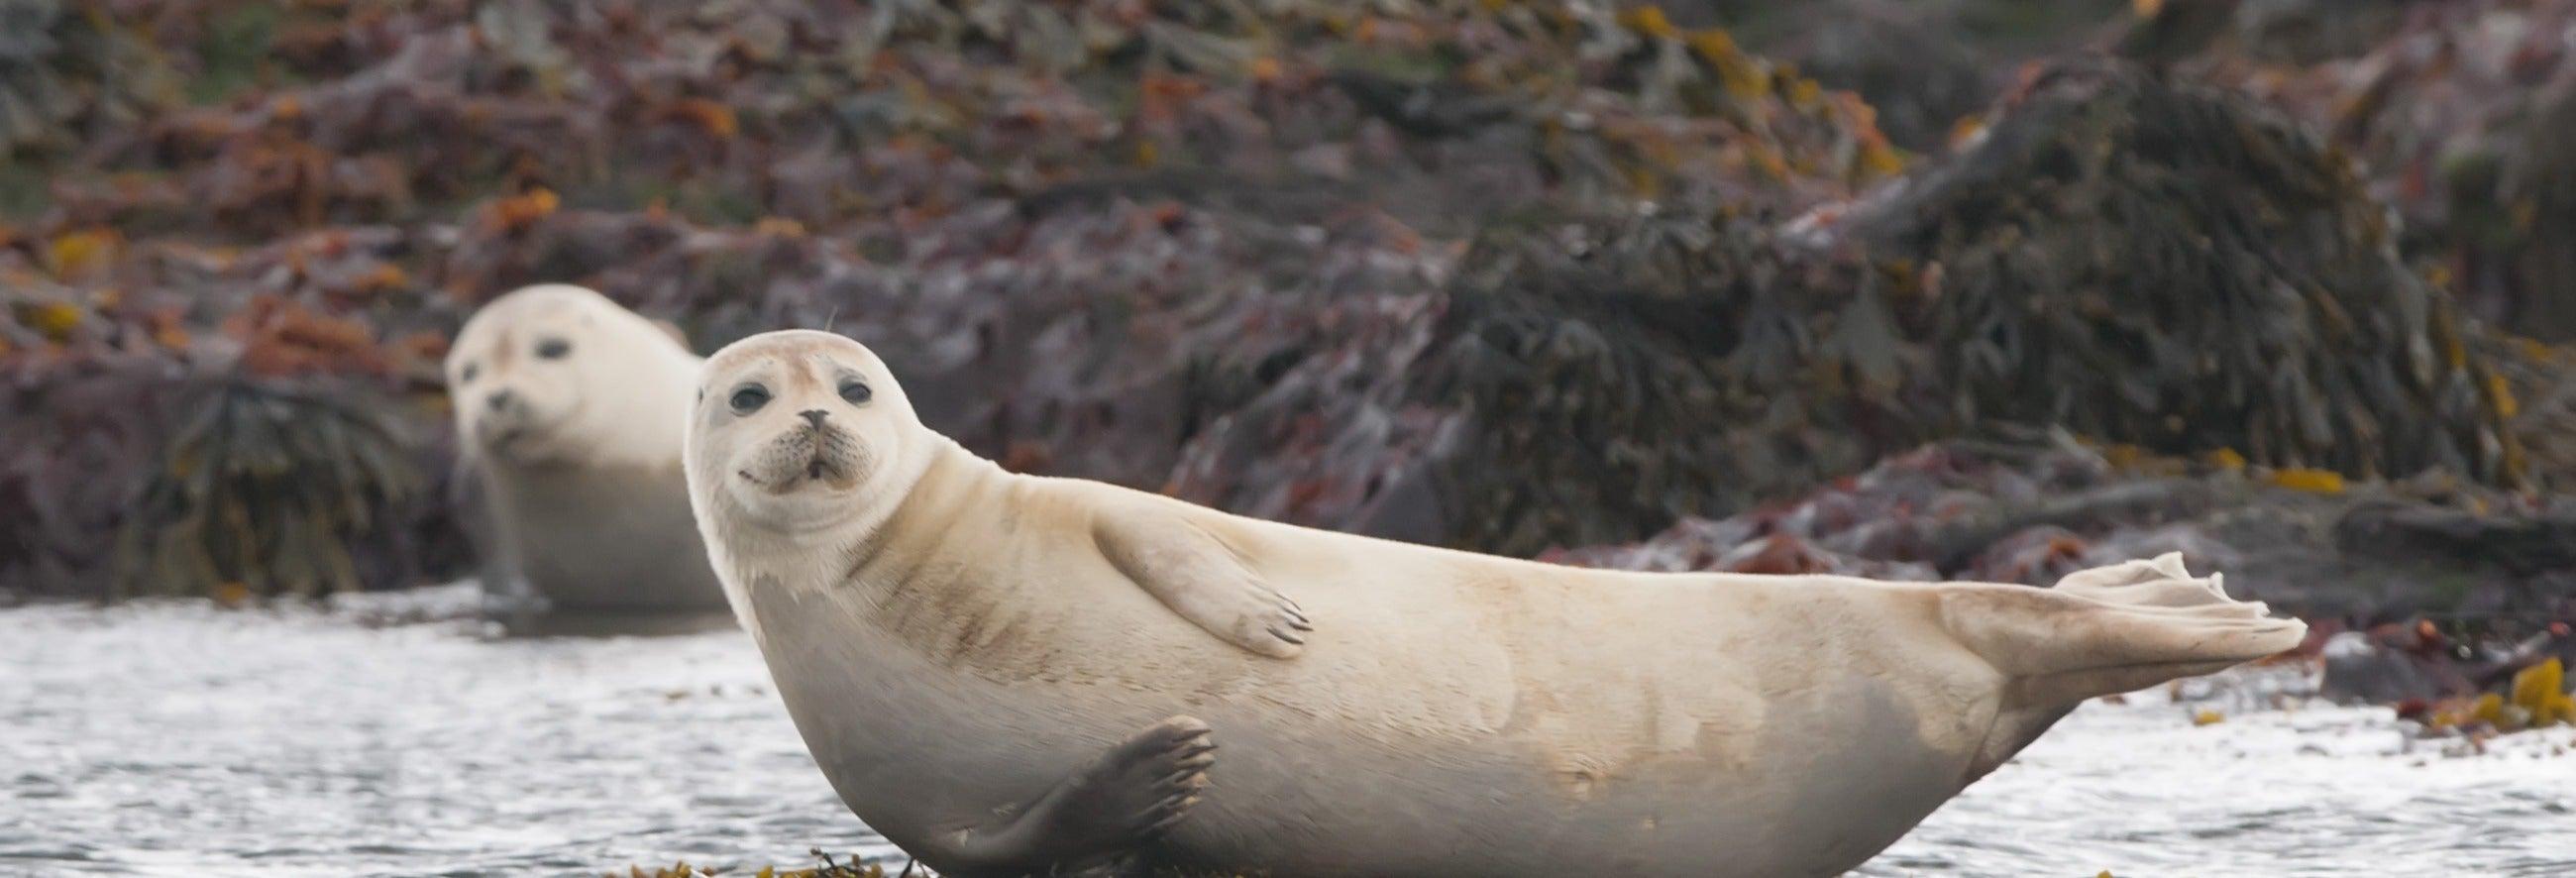 Observation de phoques à Raudasandur